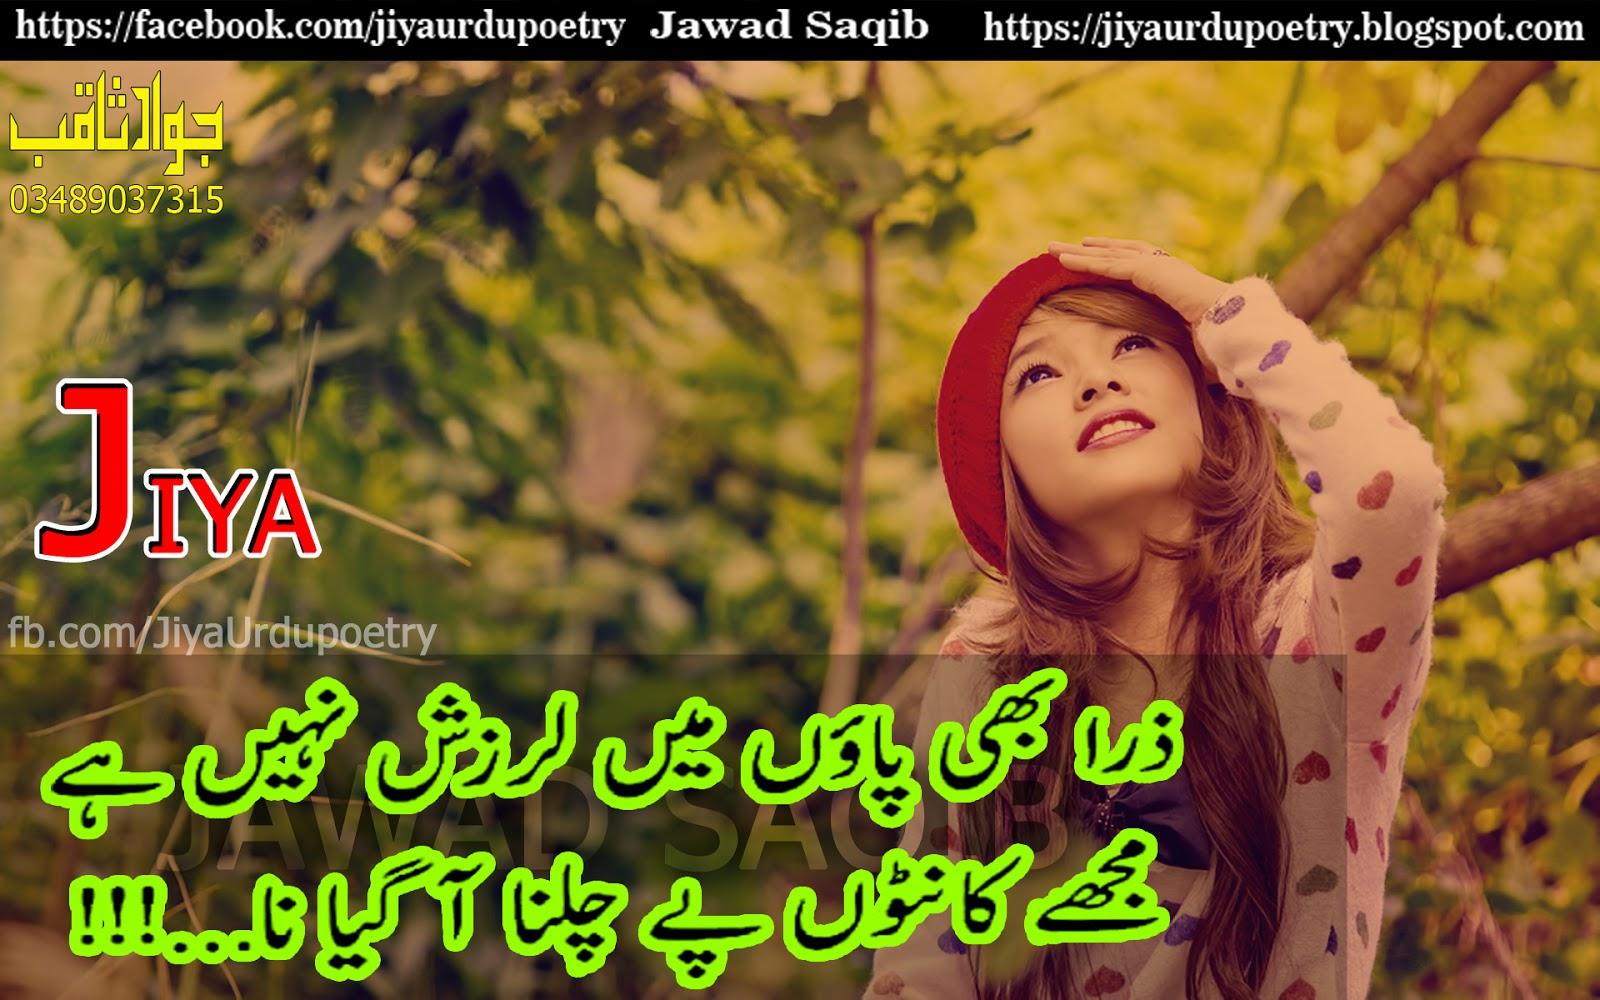 Urdu Pictures shayari